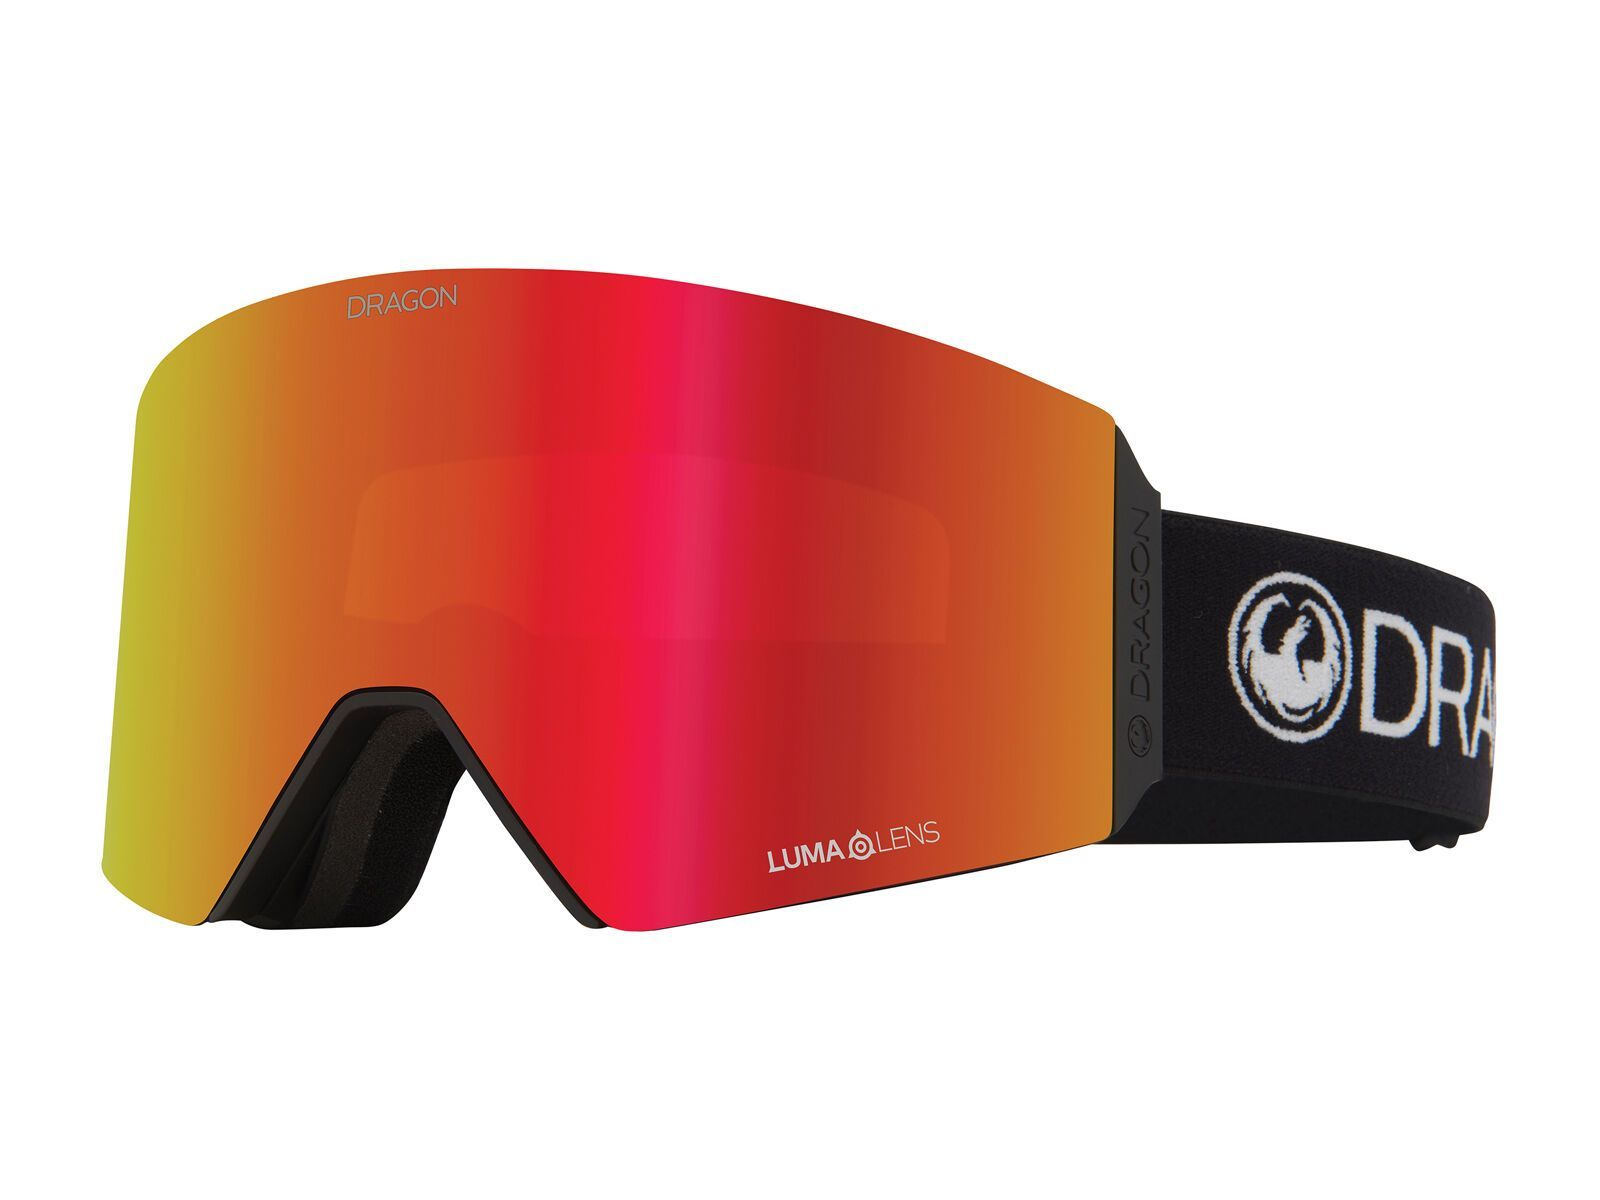 Dragon RVX OTG inkl. WS, comp/Lens: lumalens red ion - Skibrille 437347656003